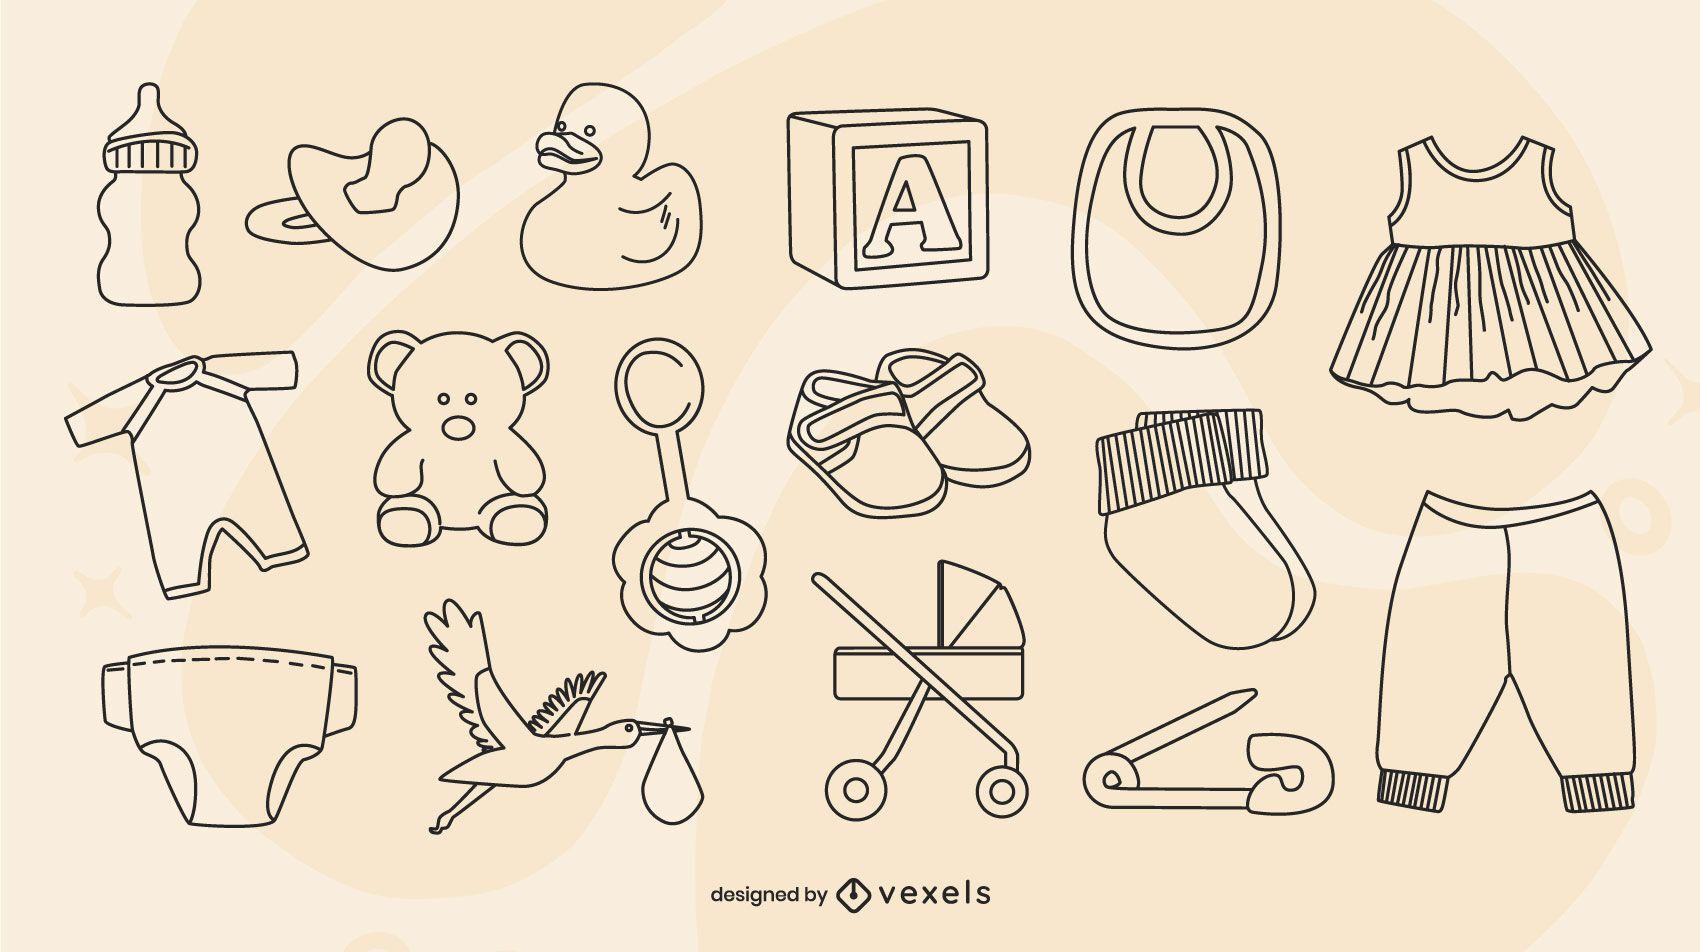 Baby elements stroke set